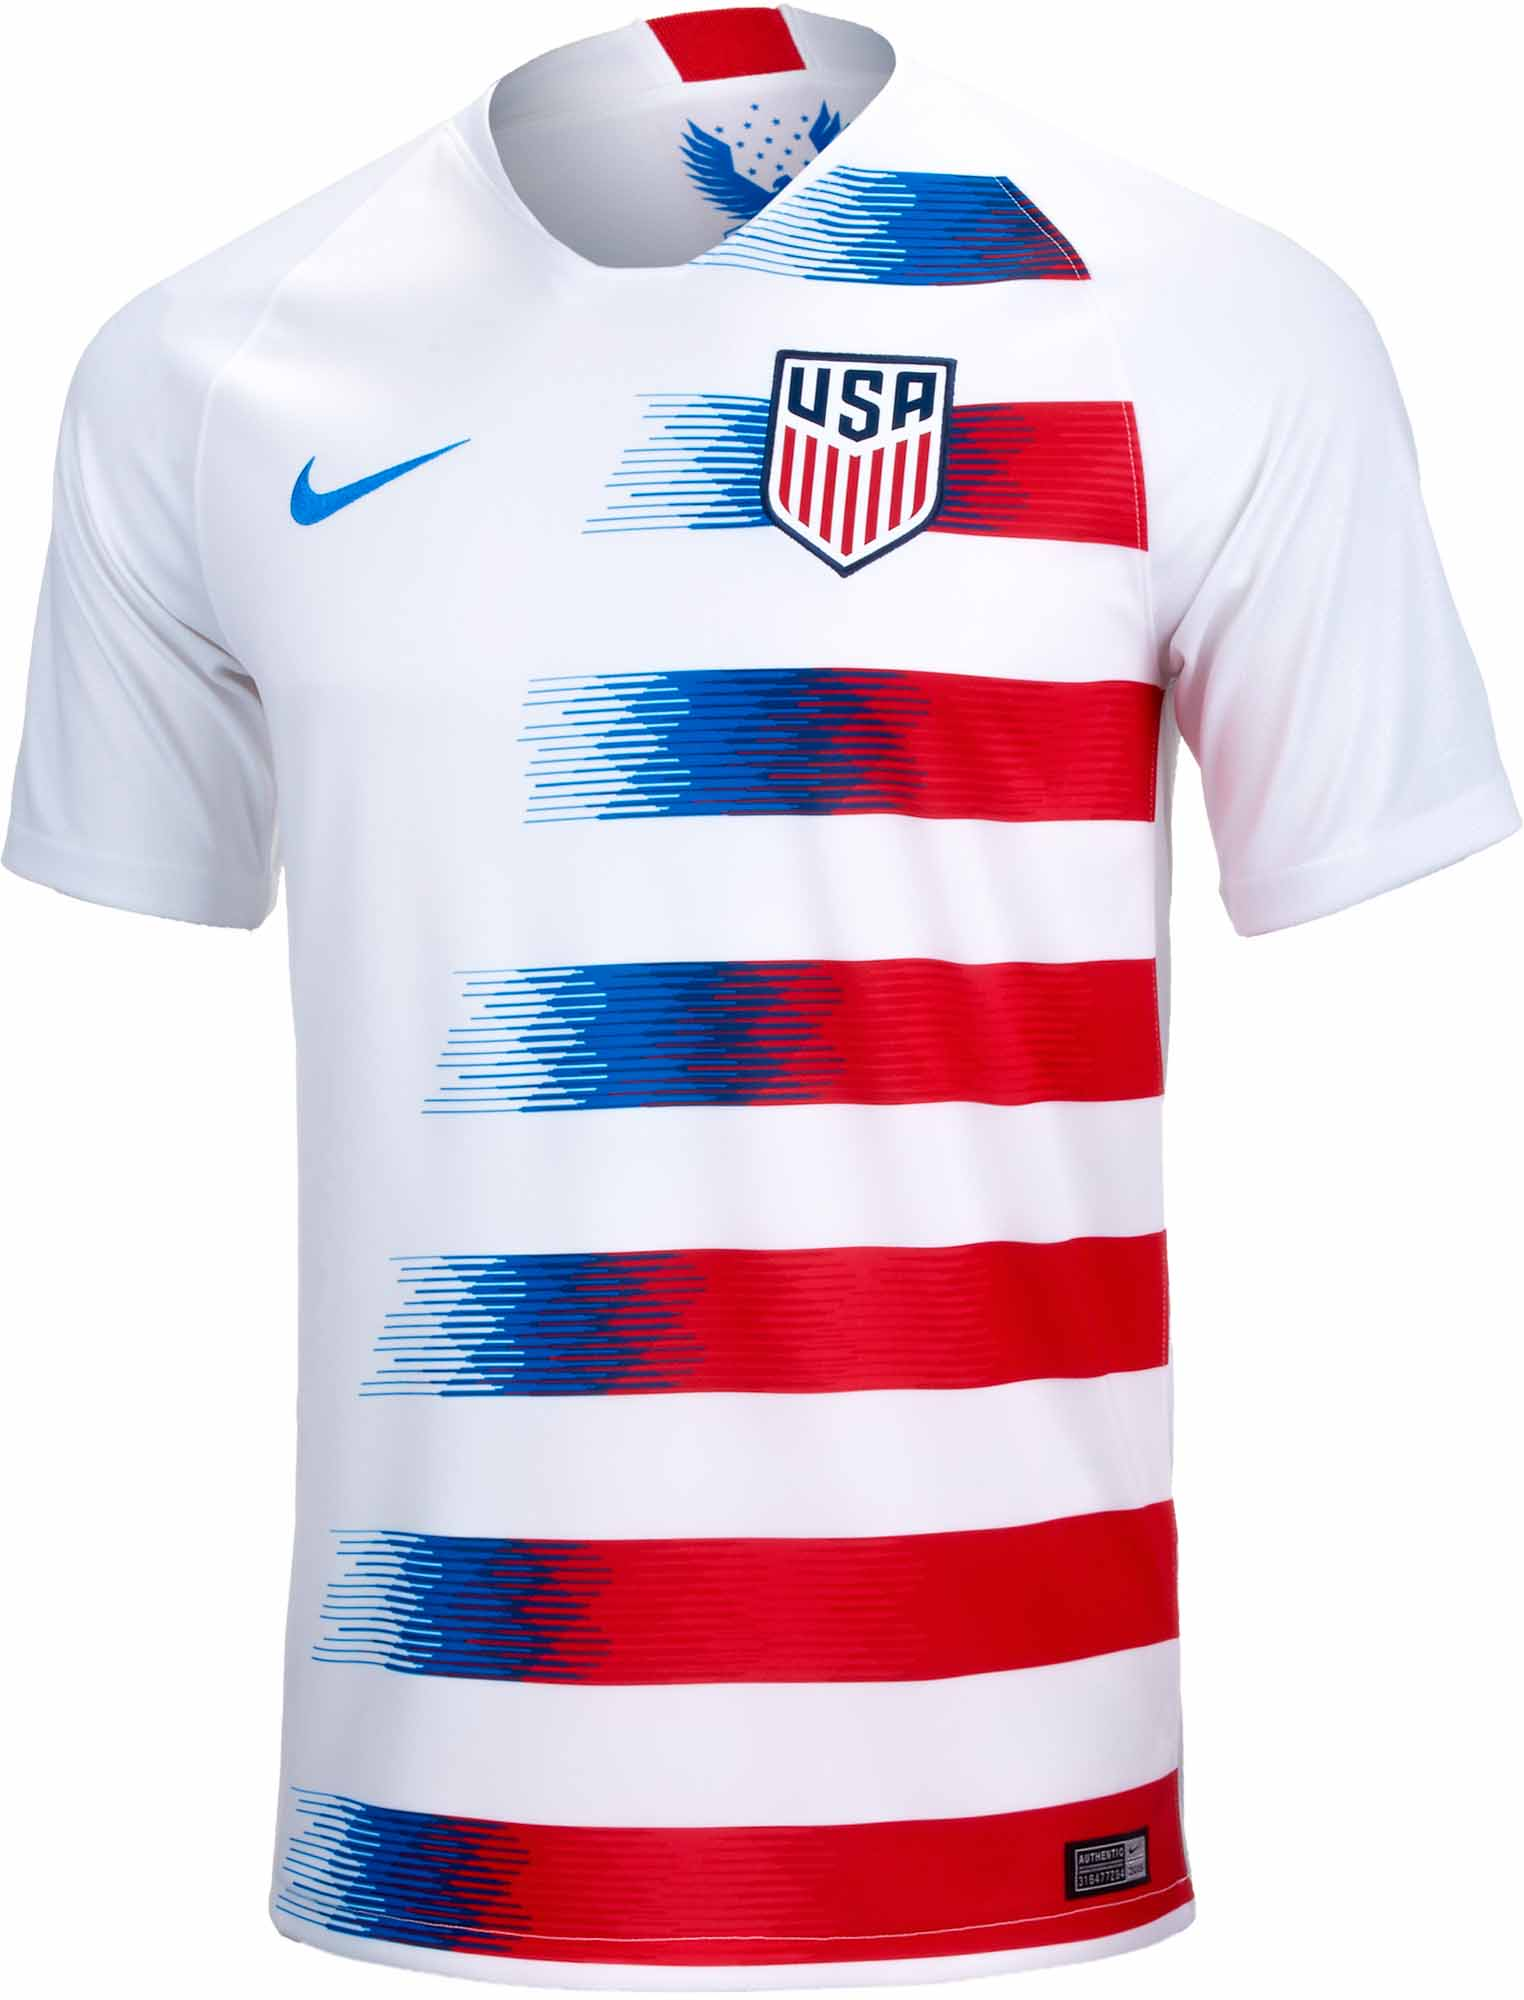 Nike USA Home Jersey 2018-19 - SoccerPro.com